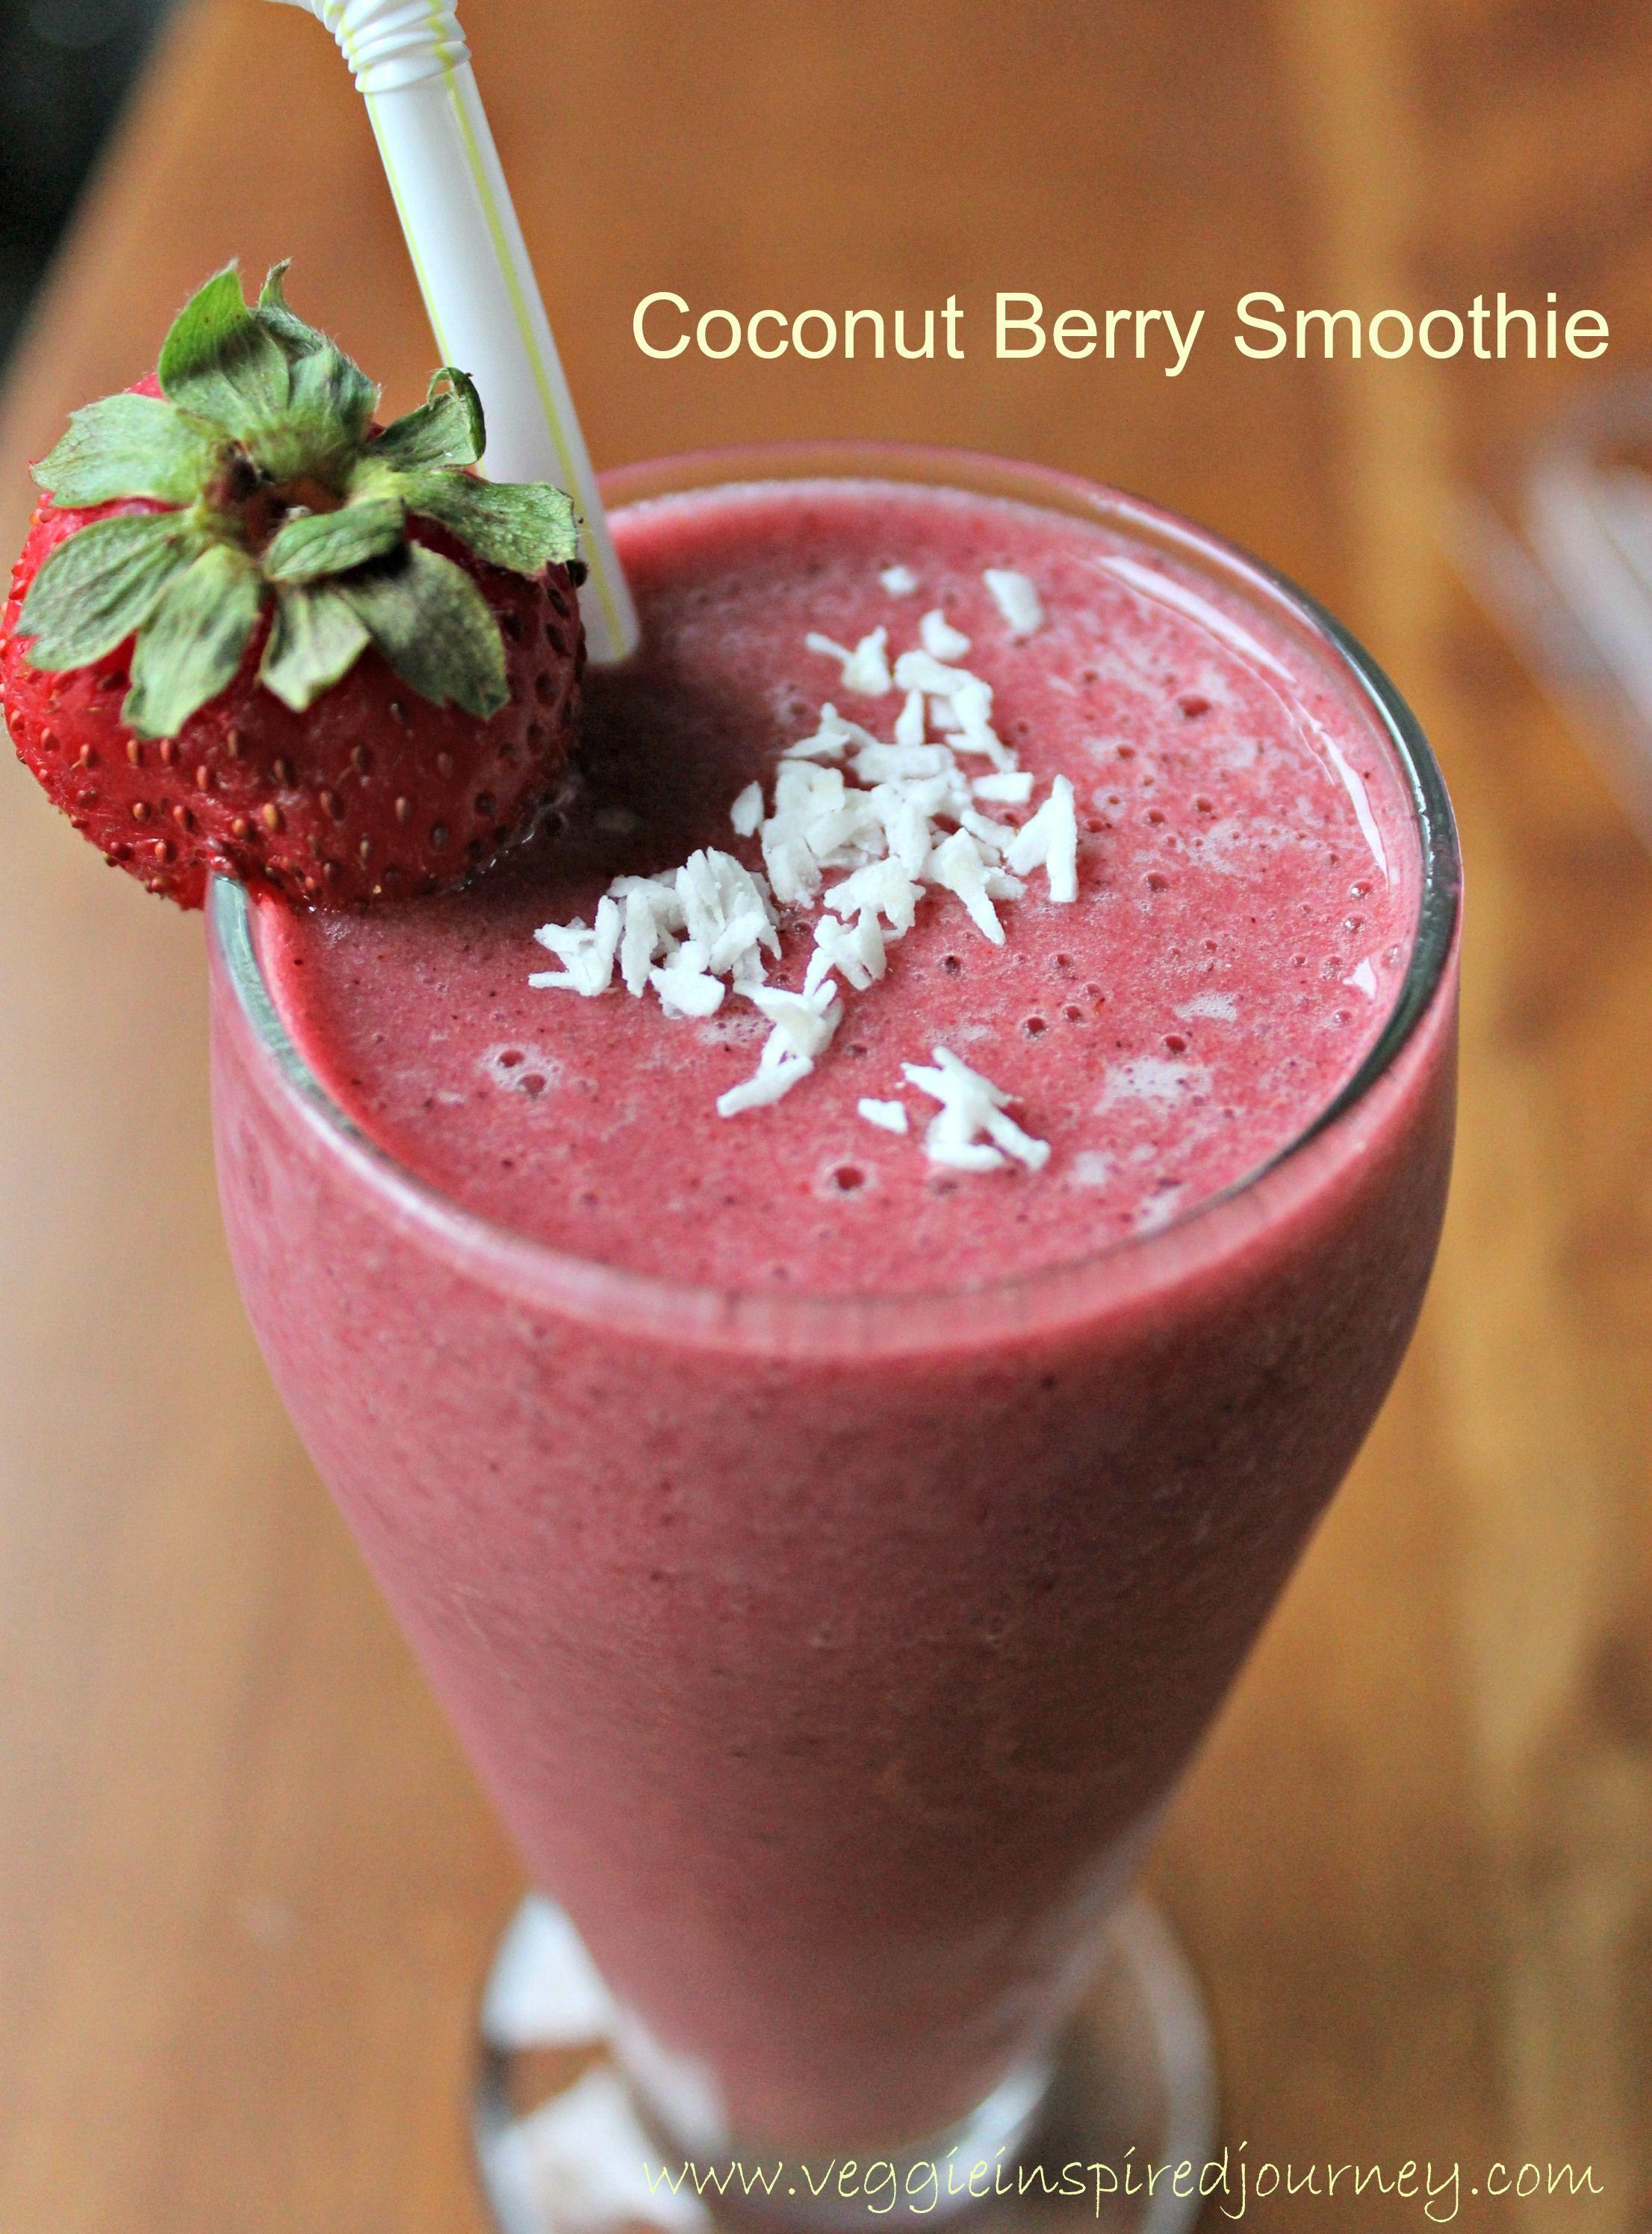 Coconut Berry Smoothie